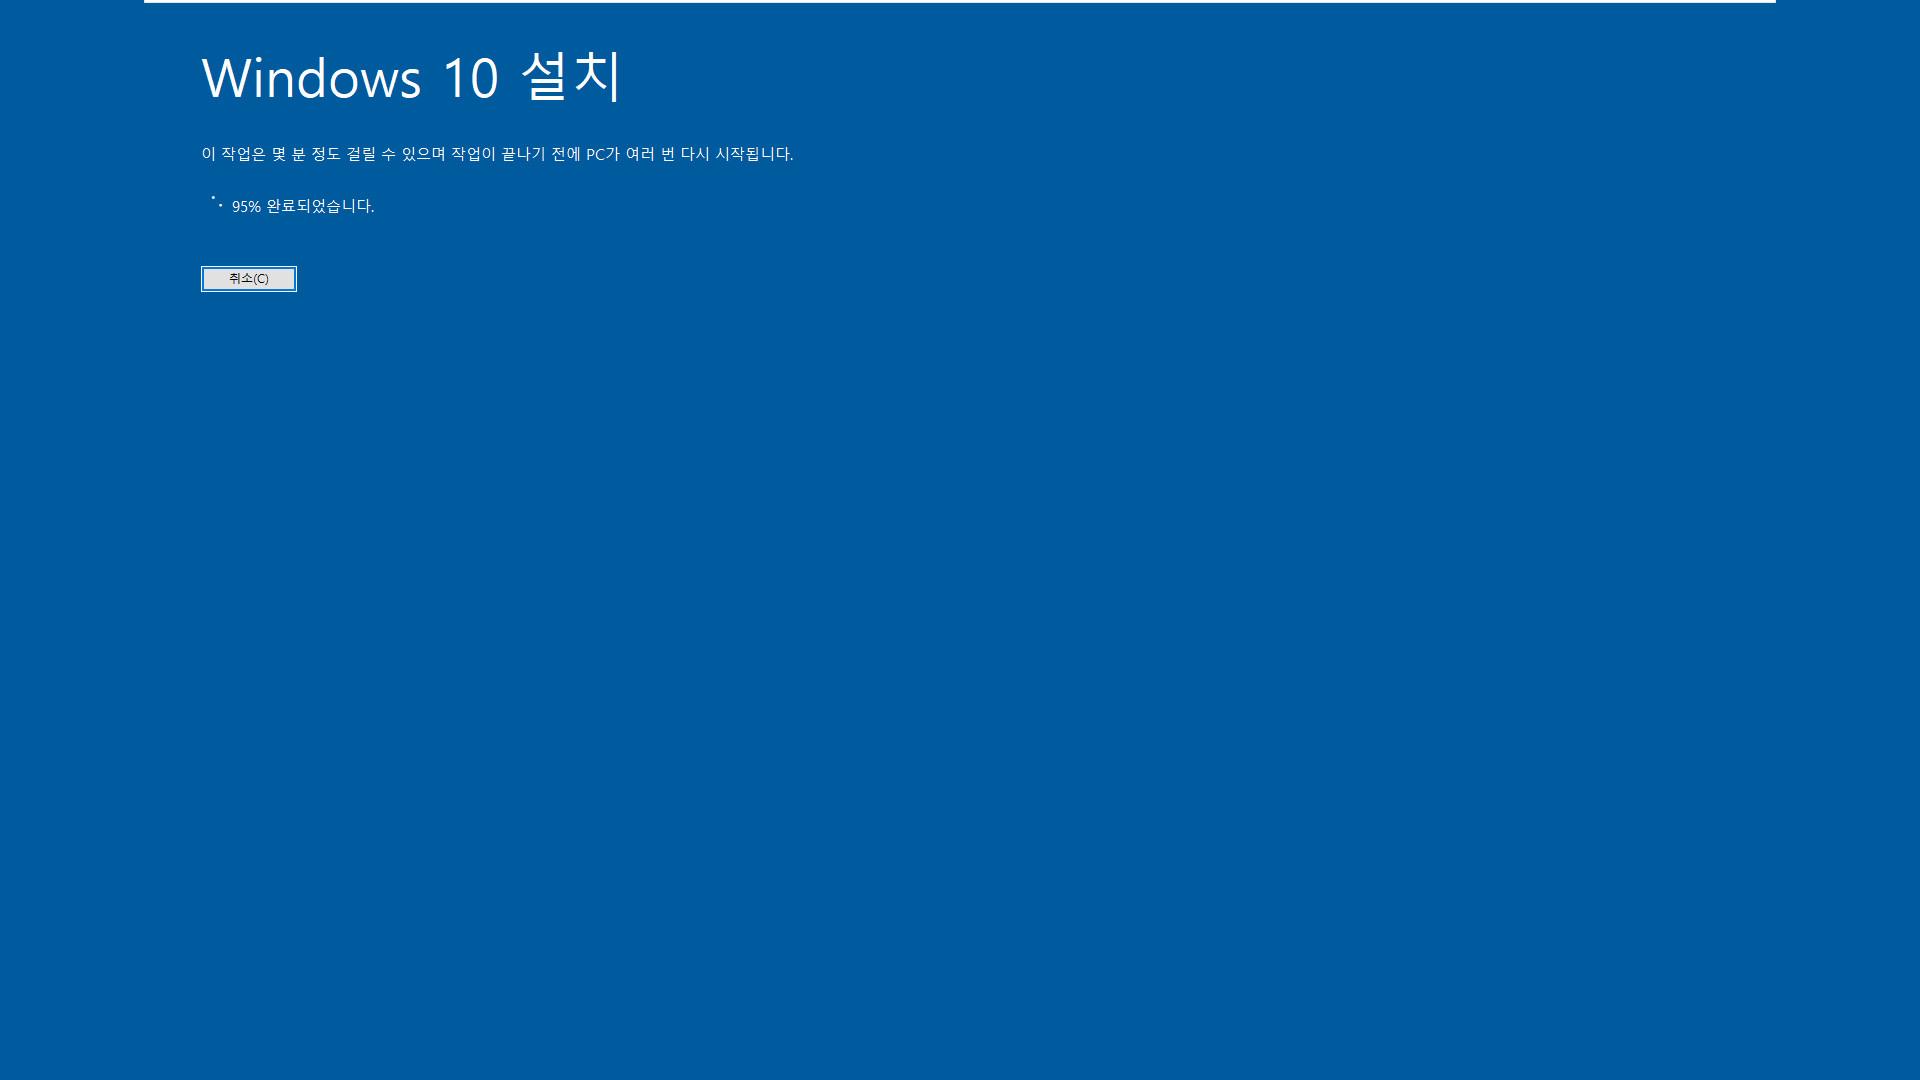 Windows 10 Enterprise LTSC [2019] (버전 1809) 를 버전 1903 프로로 업그레이드 설치하기 - 우선 설정과 앱 유지를 위해서 버전 1903 Enterprise로 업그레이드 한 후에 버전 1903 Pro로 변경하면 됩니다 2019-11-12_051155.jpg